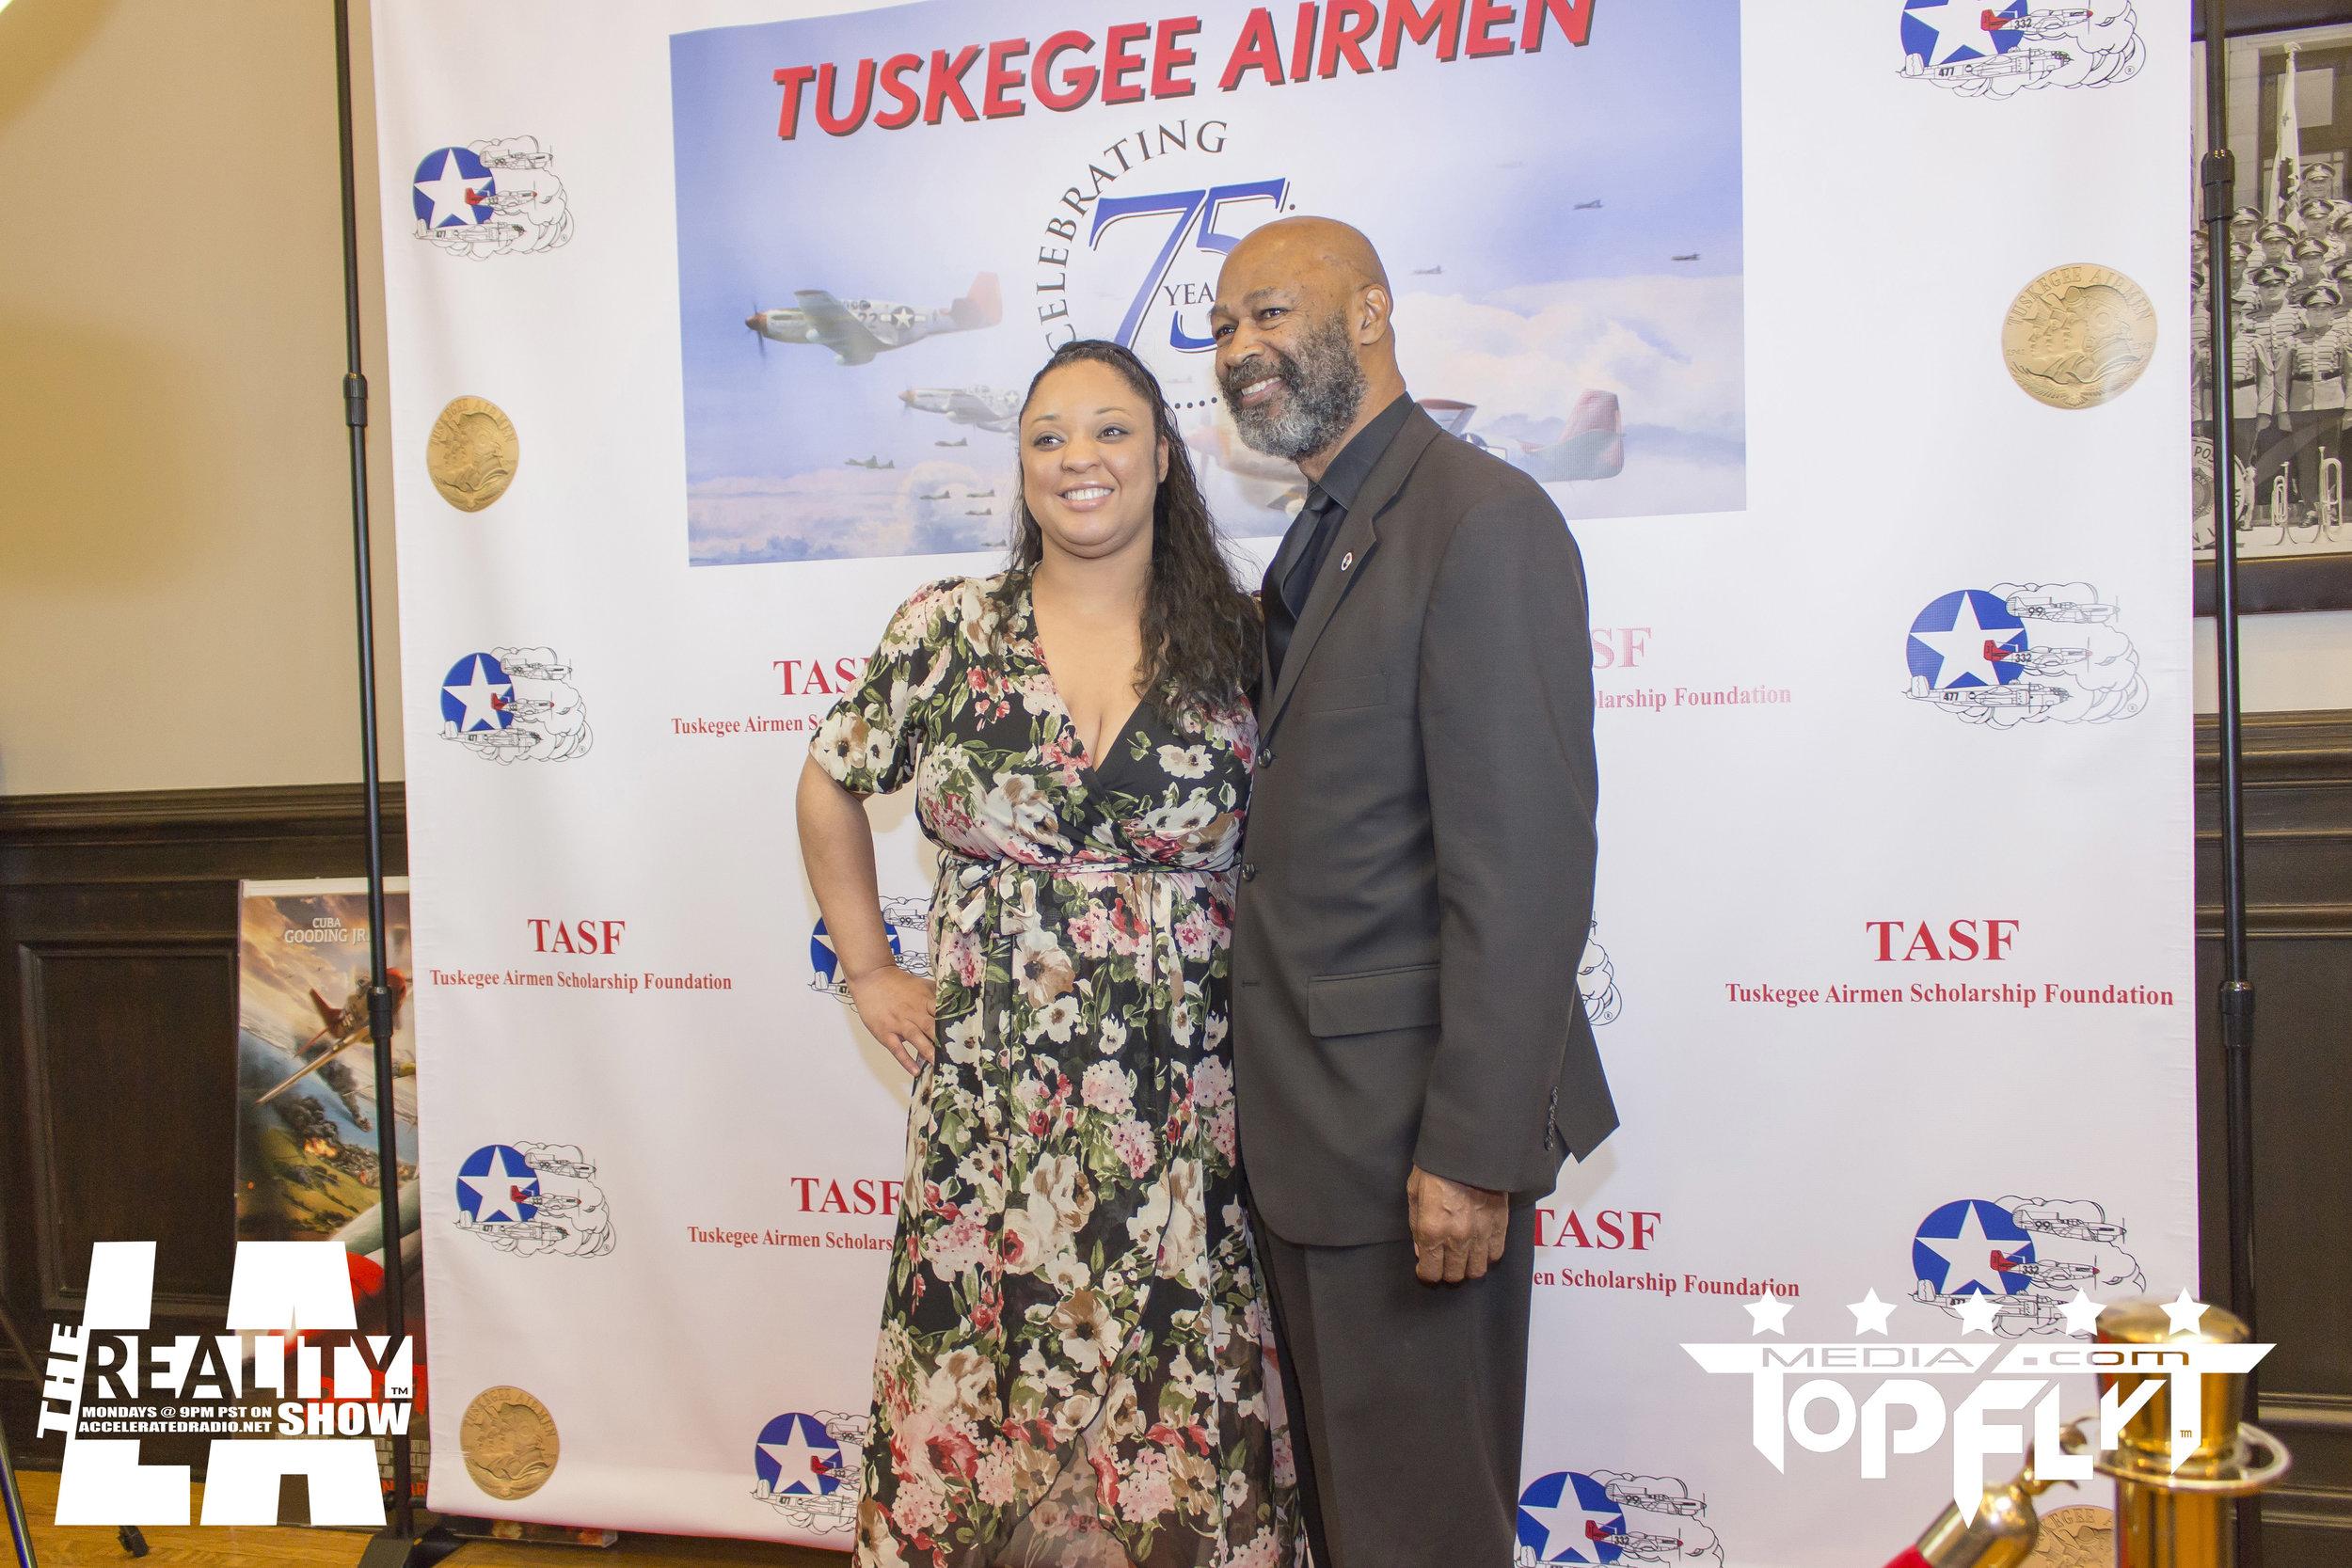 The Reality Show LA - Tuskegee Airmen 75th Anniversary VIP Reception_115.jpg